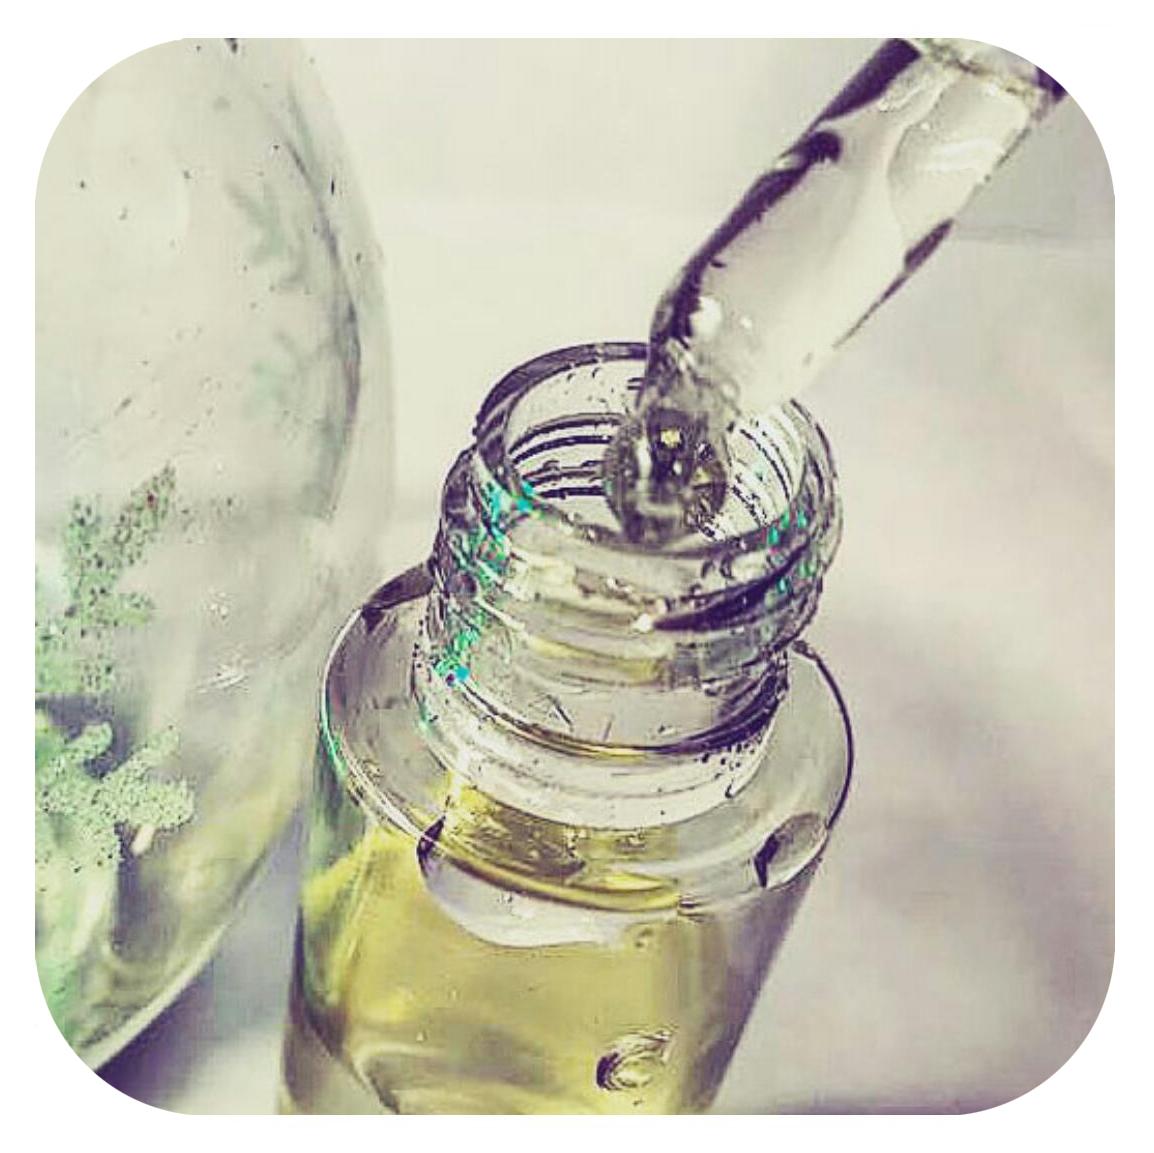 ricetta acido ialuronico fluido 4.0